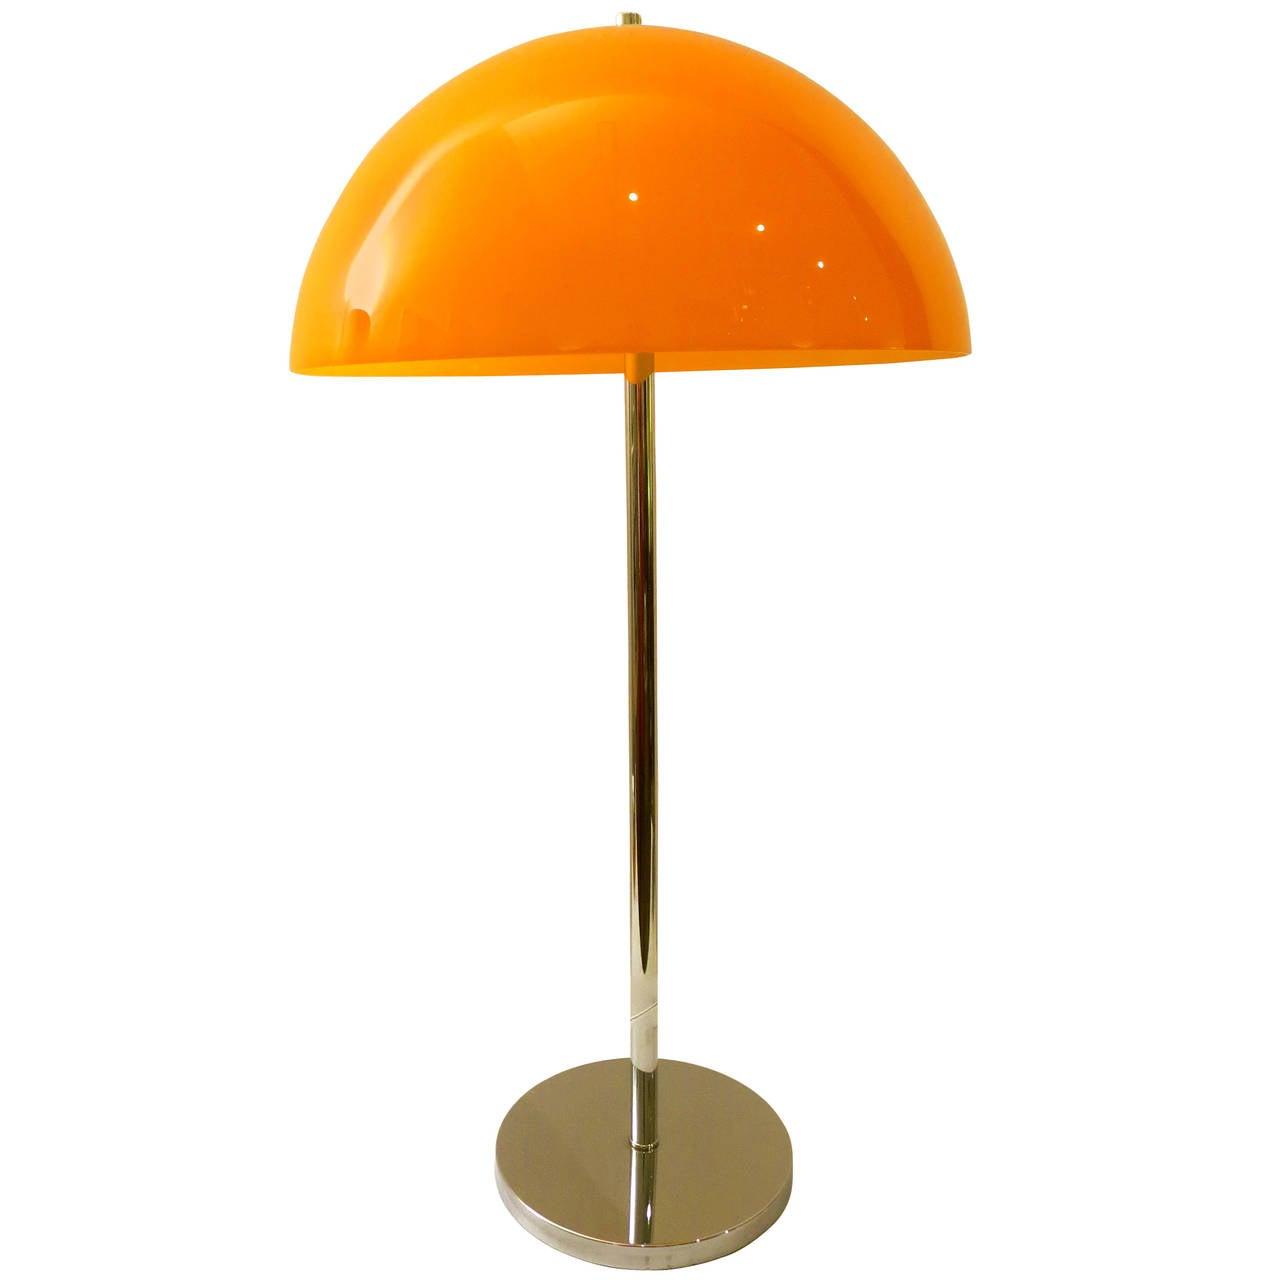 1960s Pop Desk Lamp In Orange Mushroom Glass Shade U0026 Chrome Stand For Sale Ideas